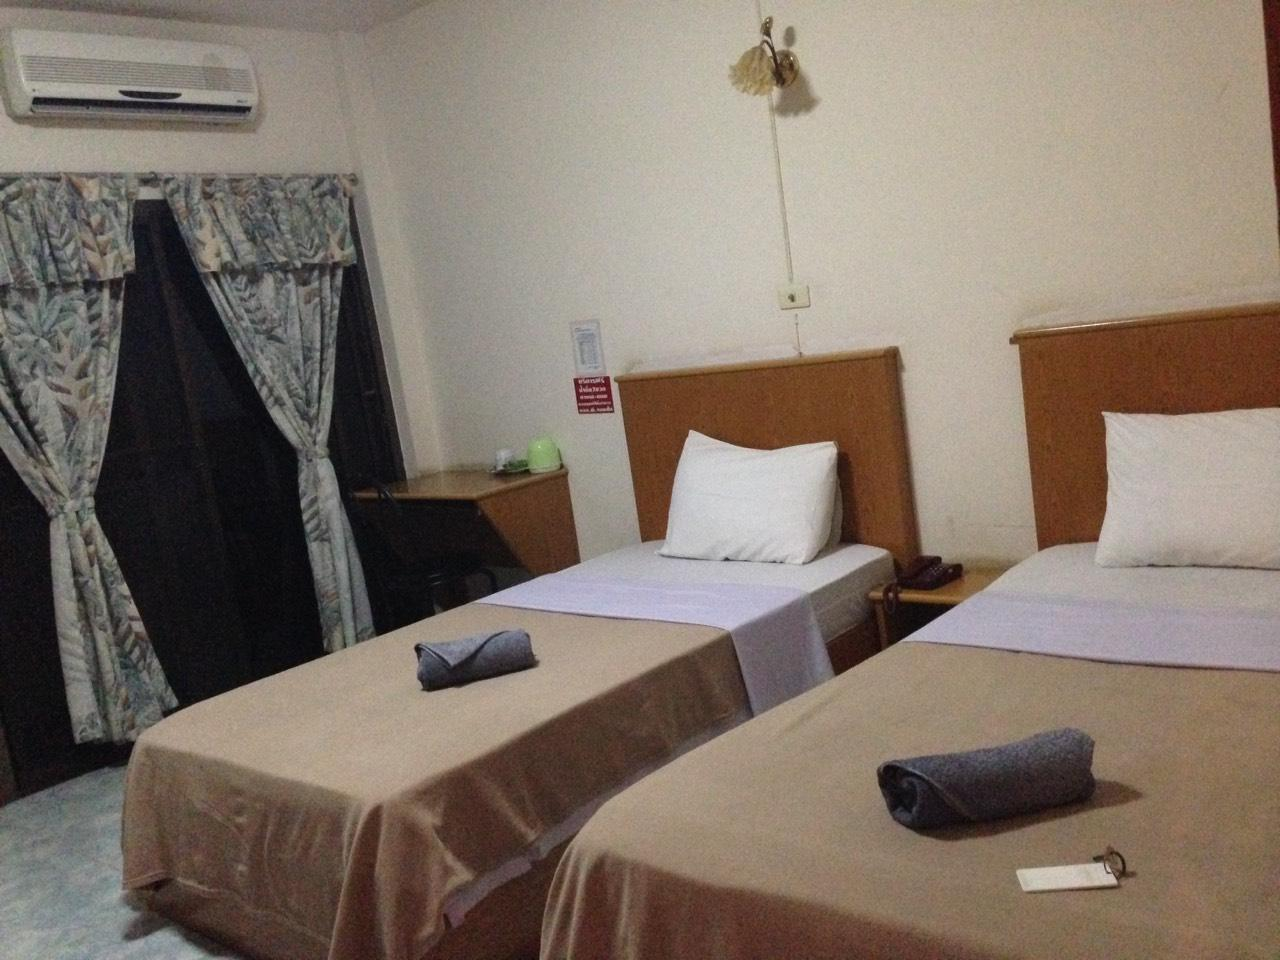 L.P.大楼酒店,แอล พี แมนชั่น